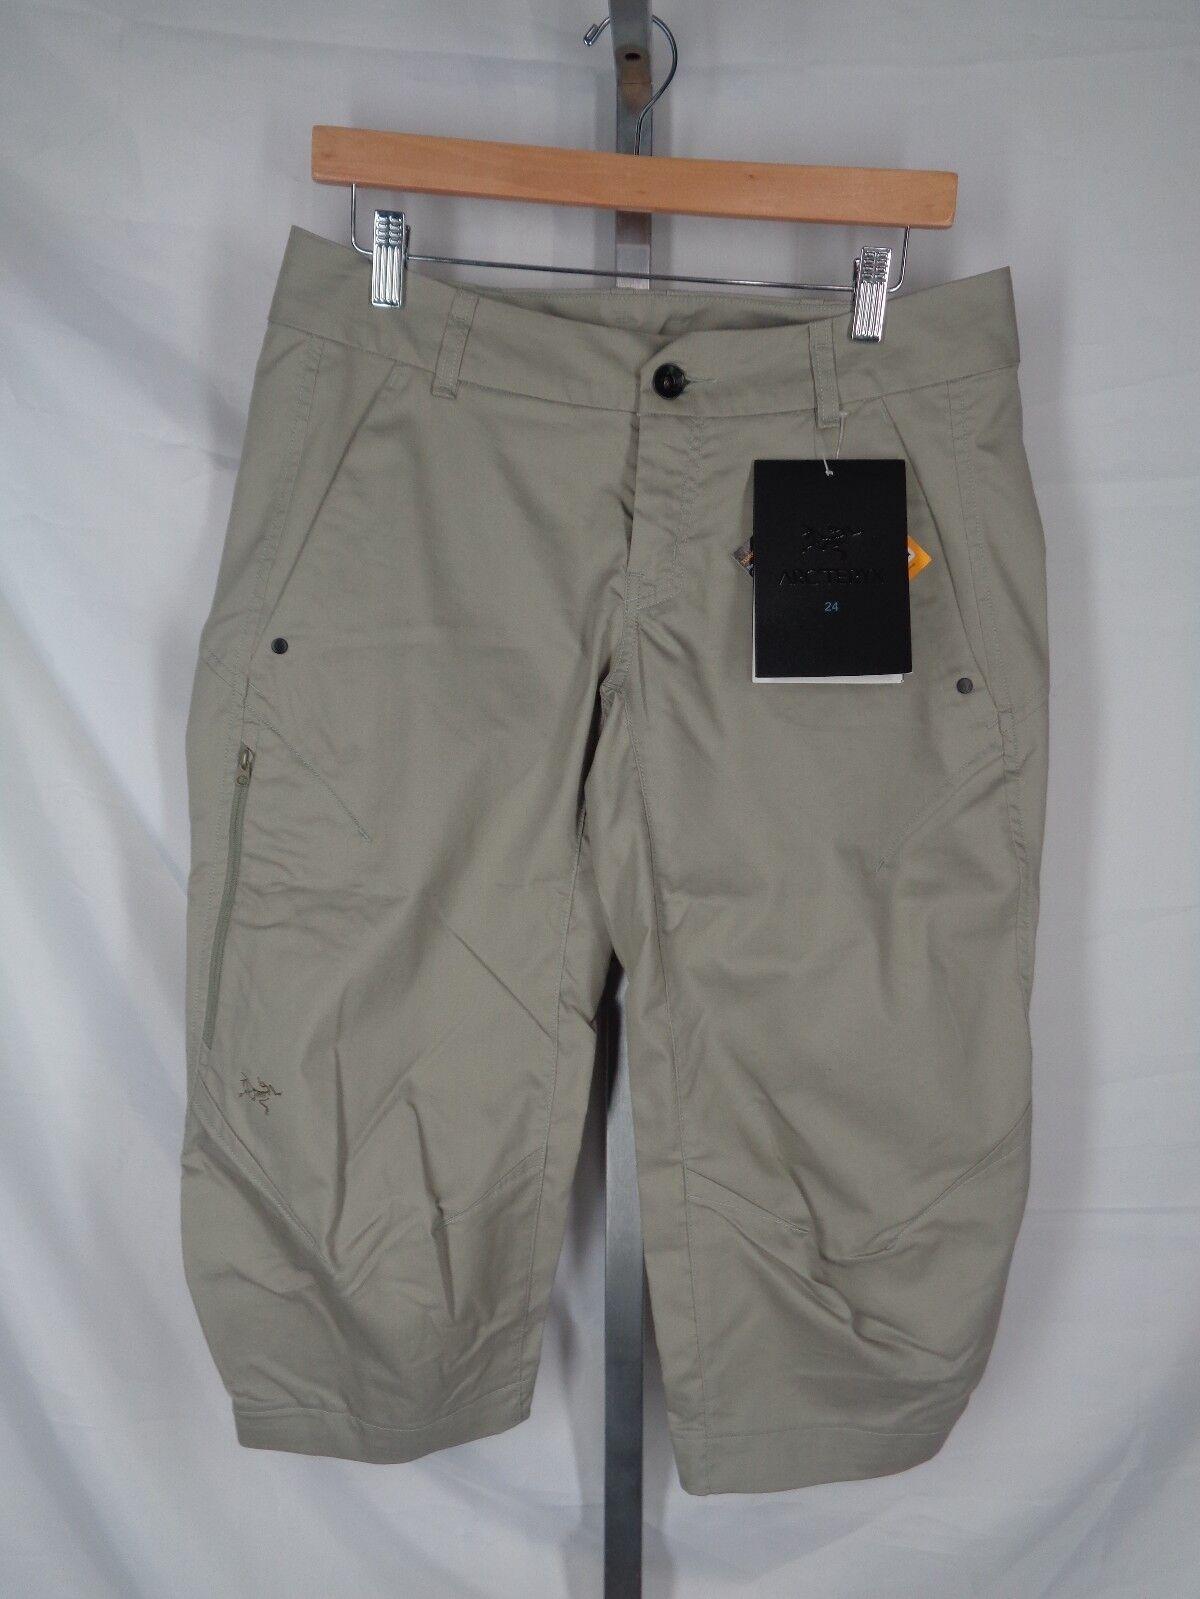 Arc'teryx A2B Commuter Crop Pants Size 8 Womens Trim Fit Light Carbide New